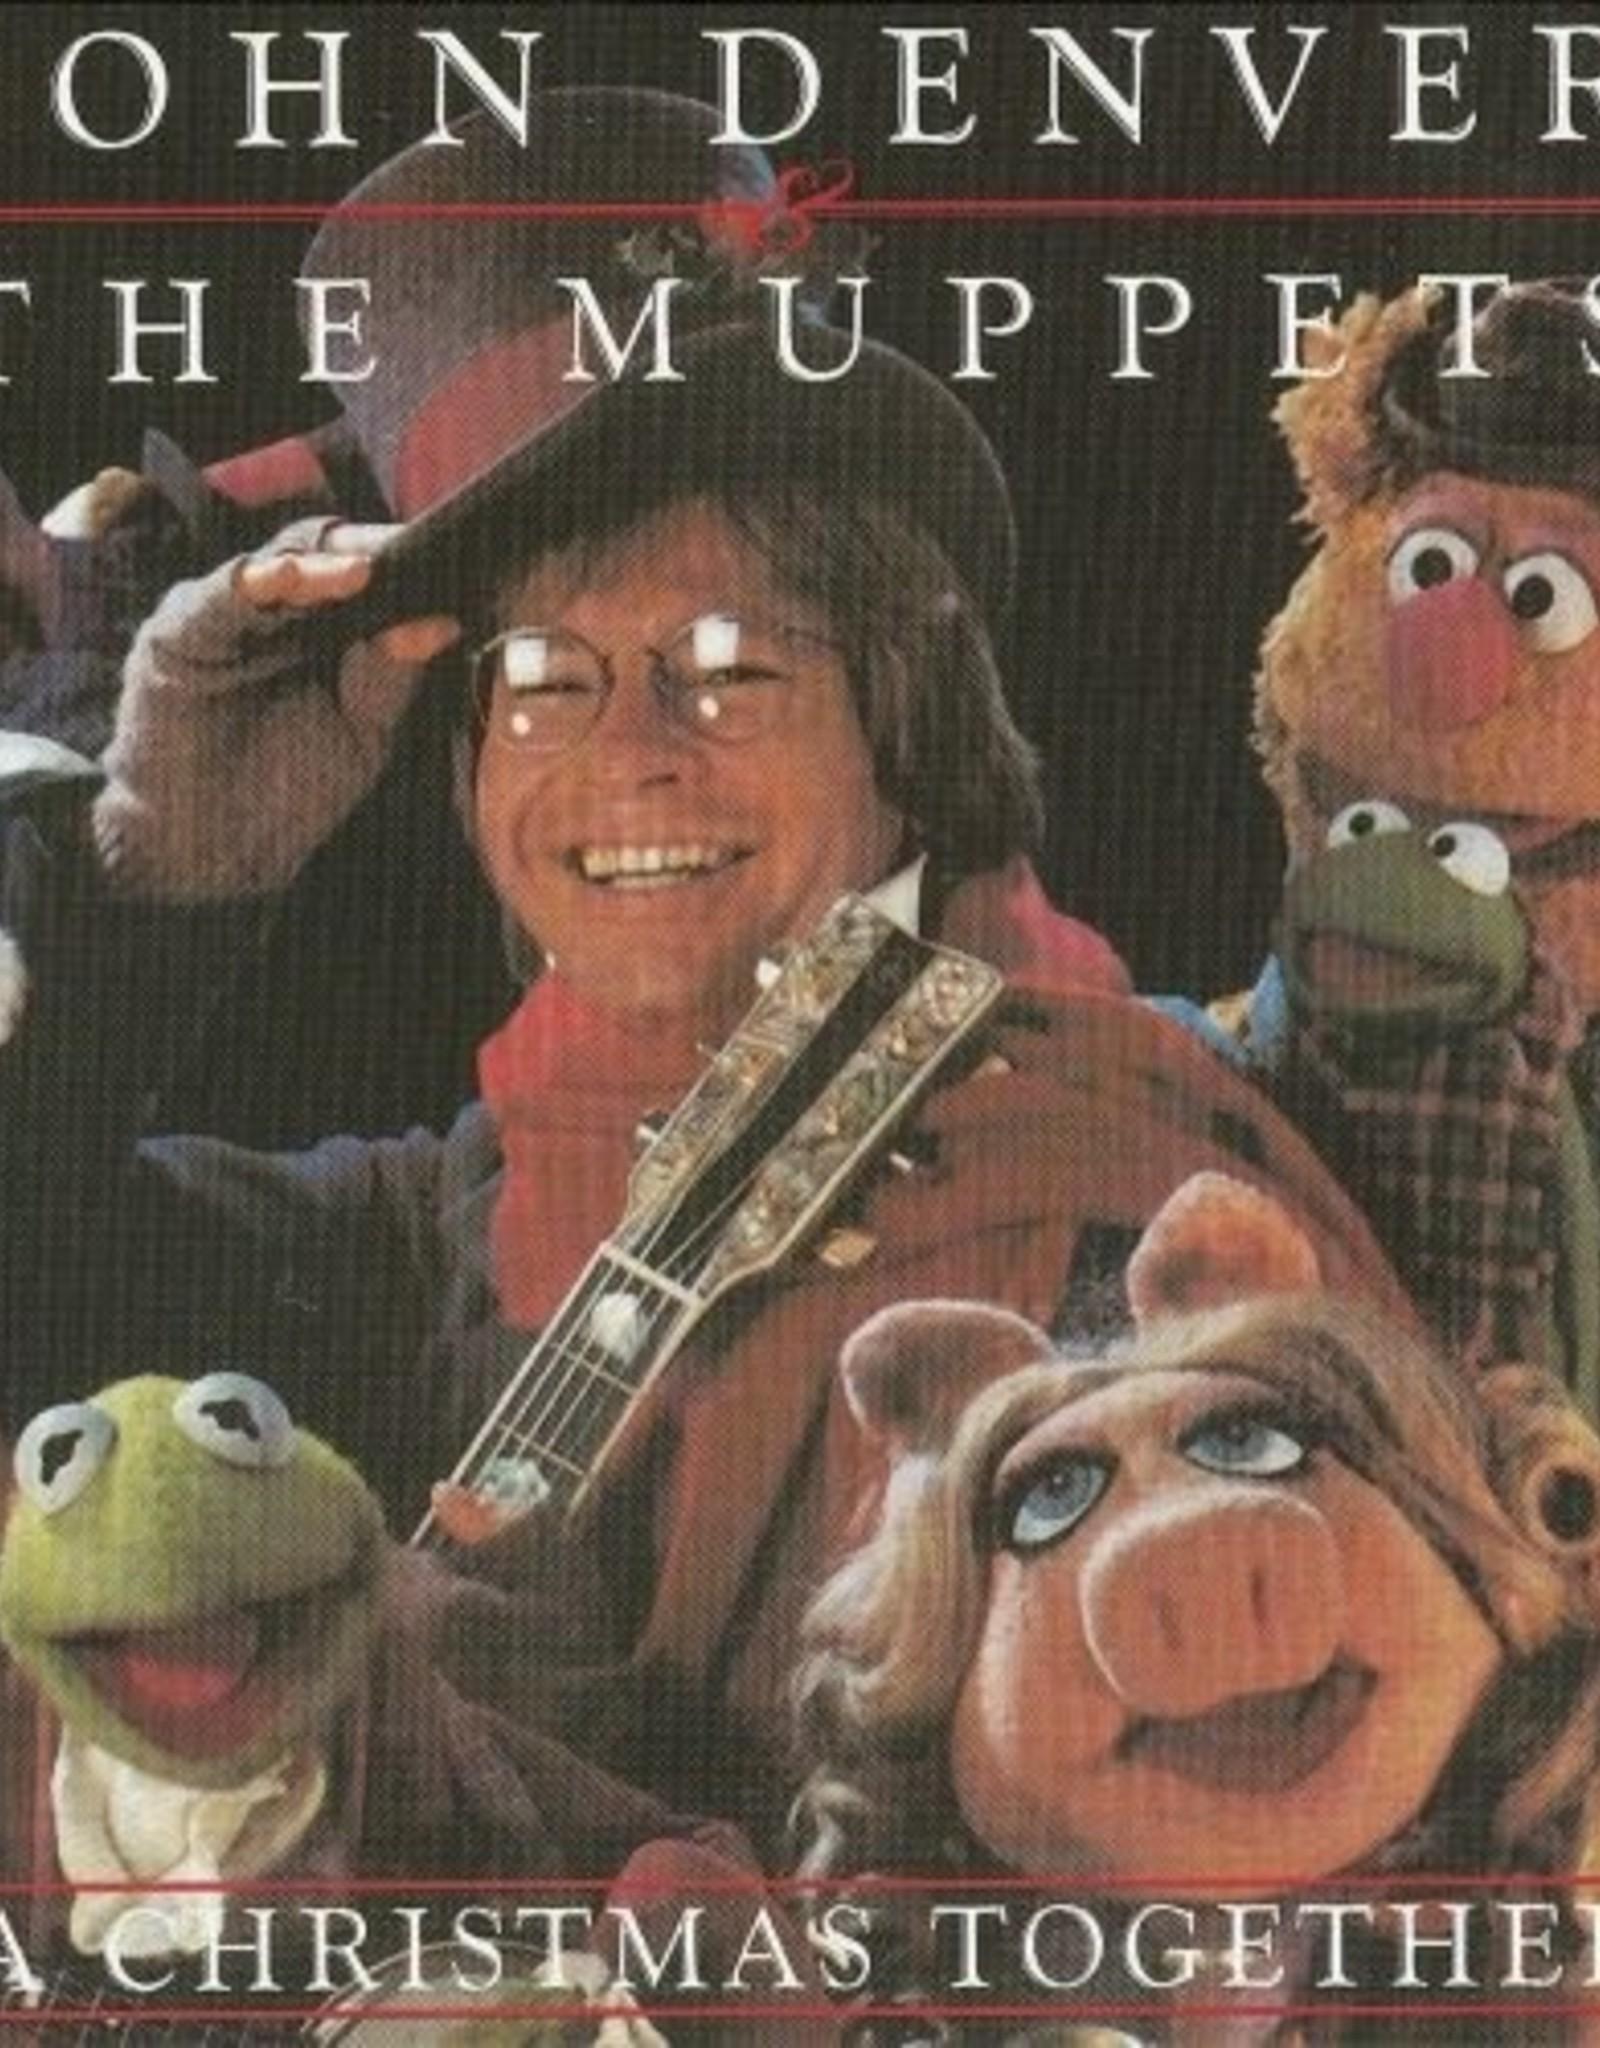 John Denver & the Muppets - Christmas Together (Green Vinyl)